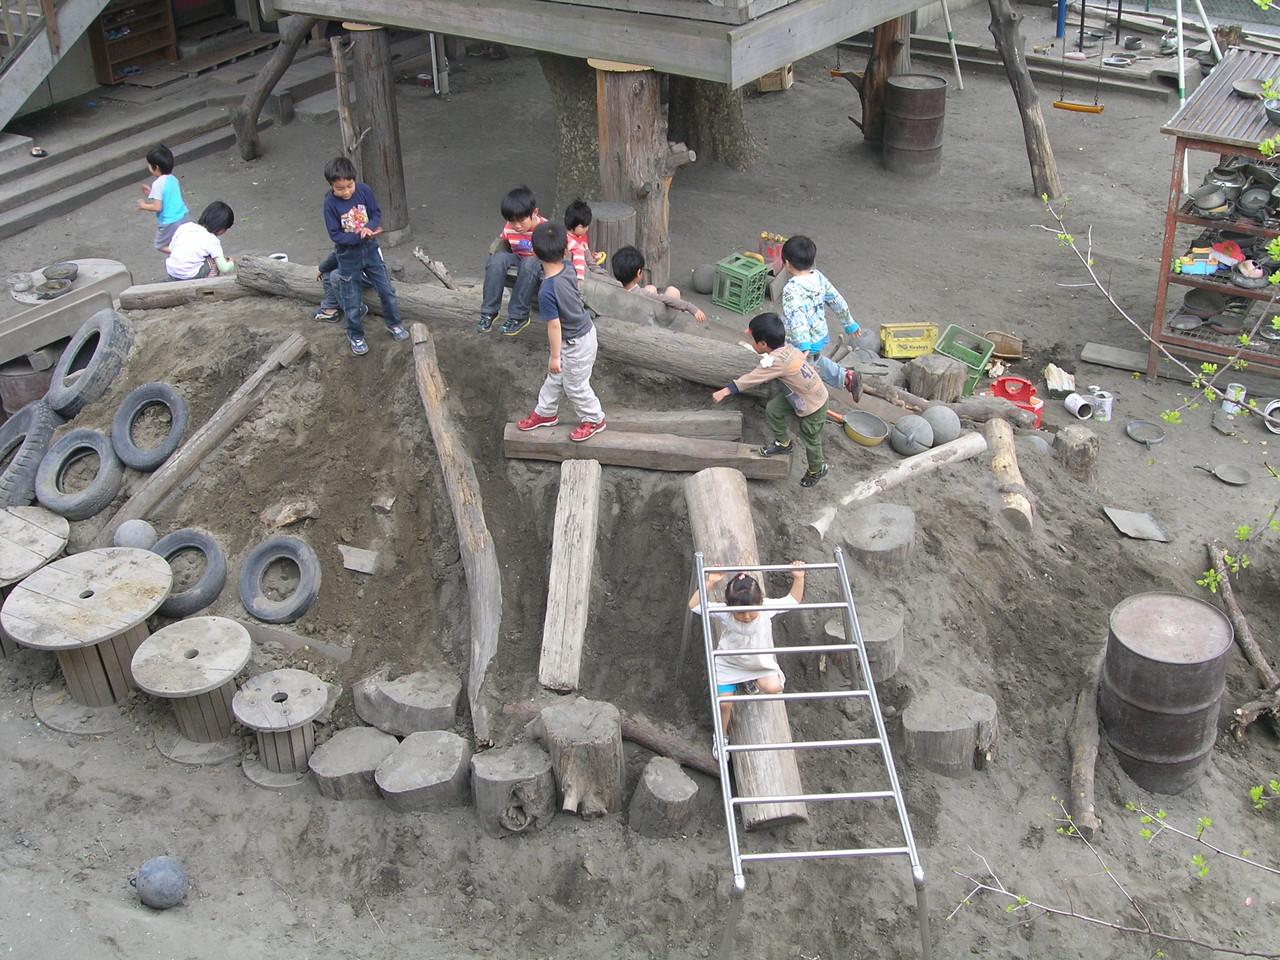 2013年4月22日園庭改造後1日目.子供達の反応や如何!